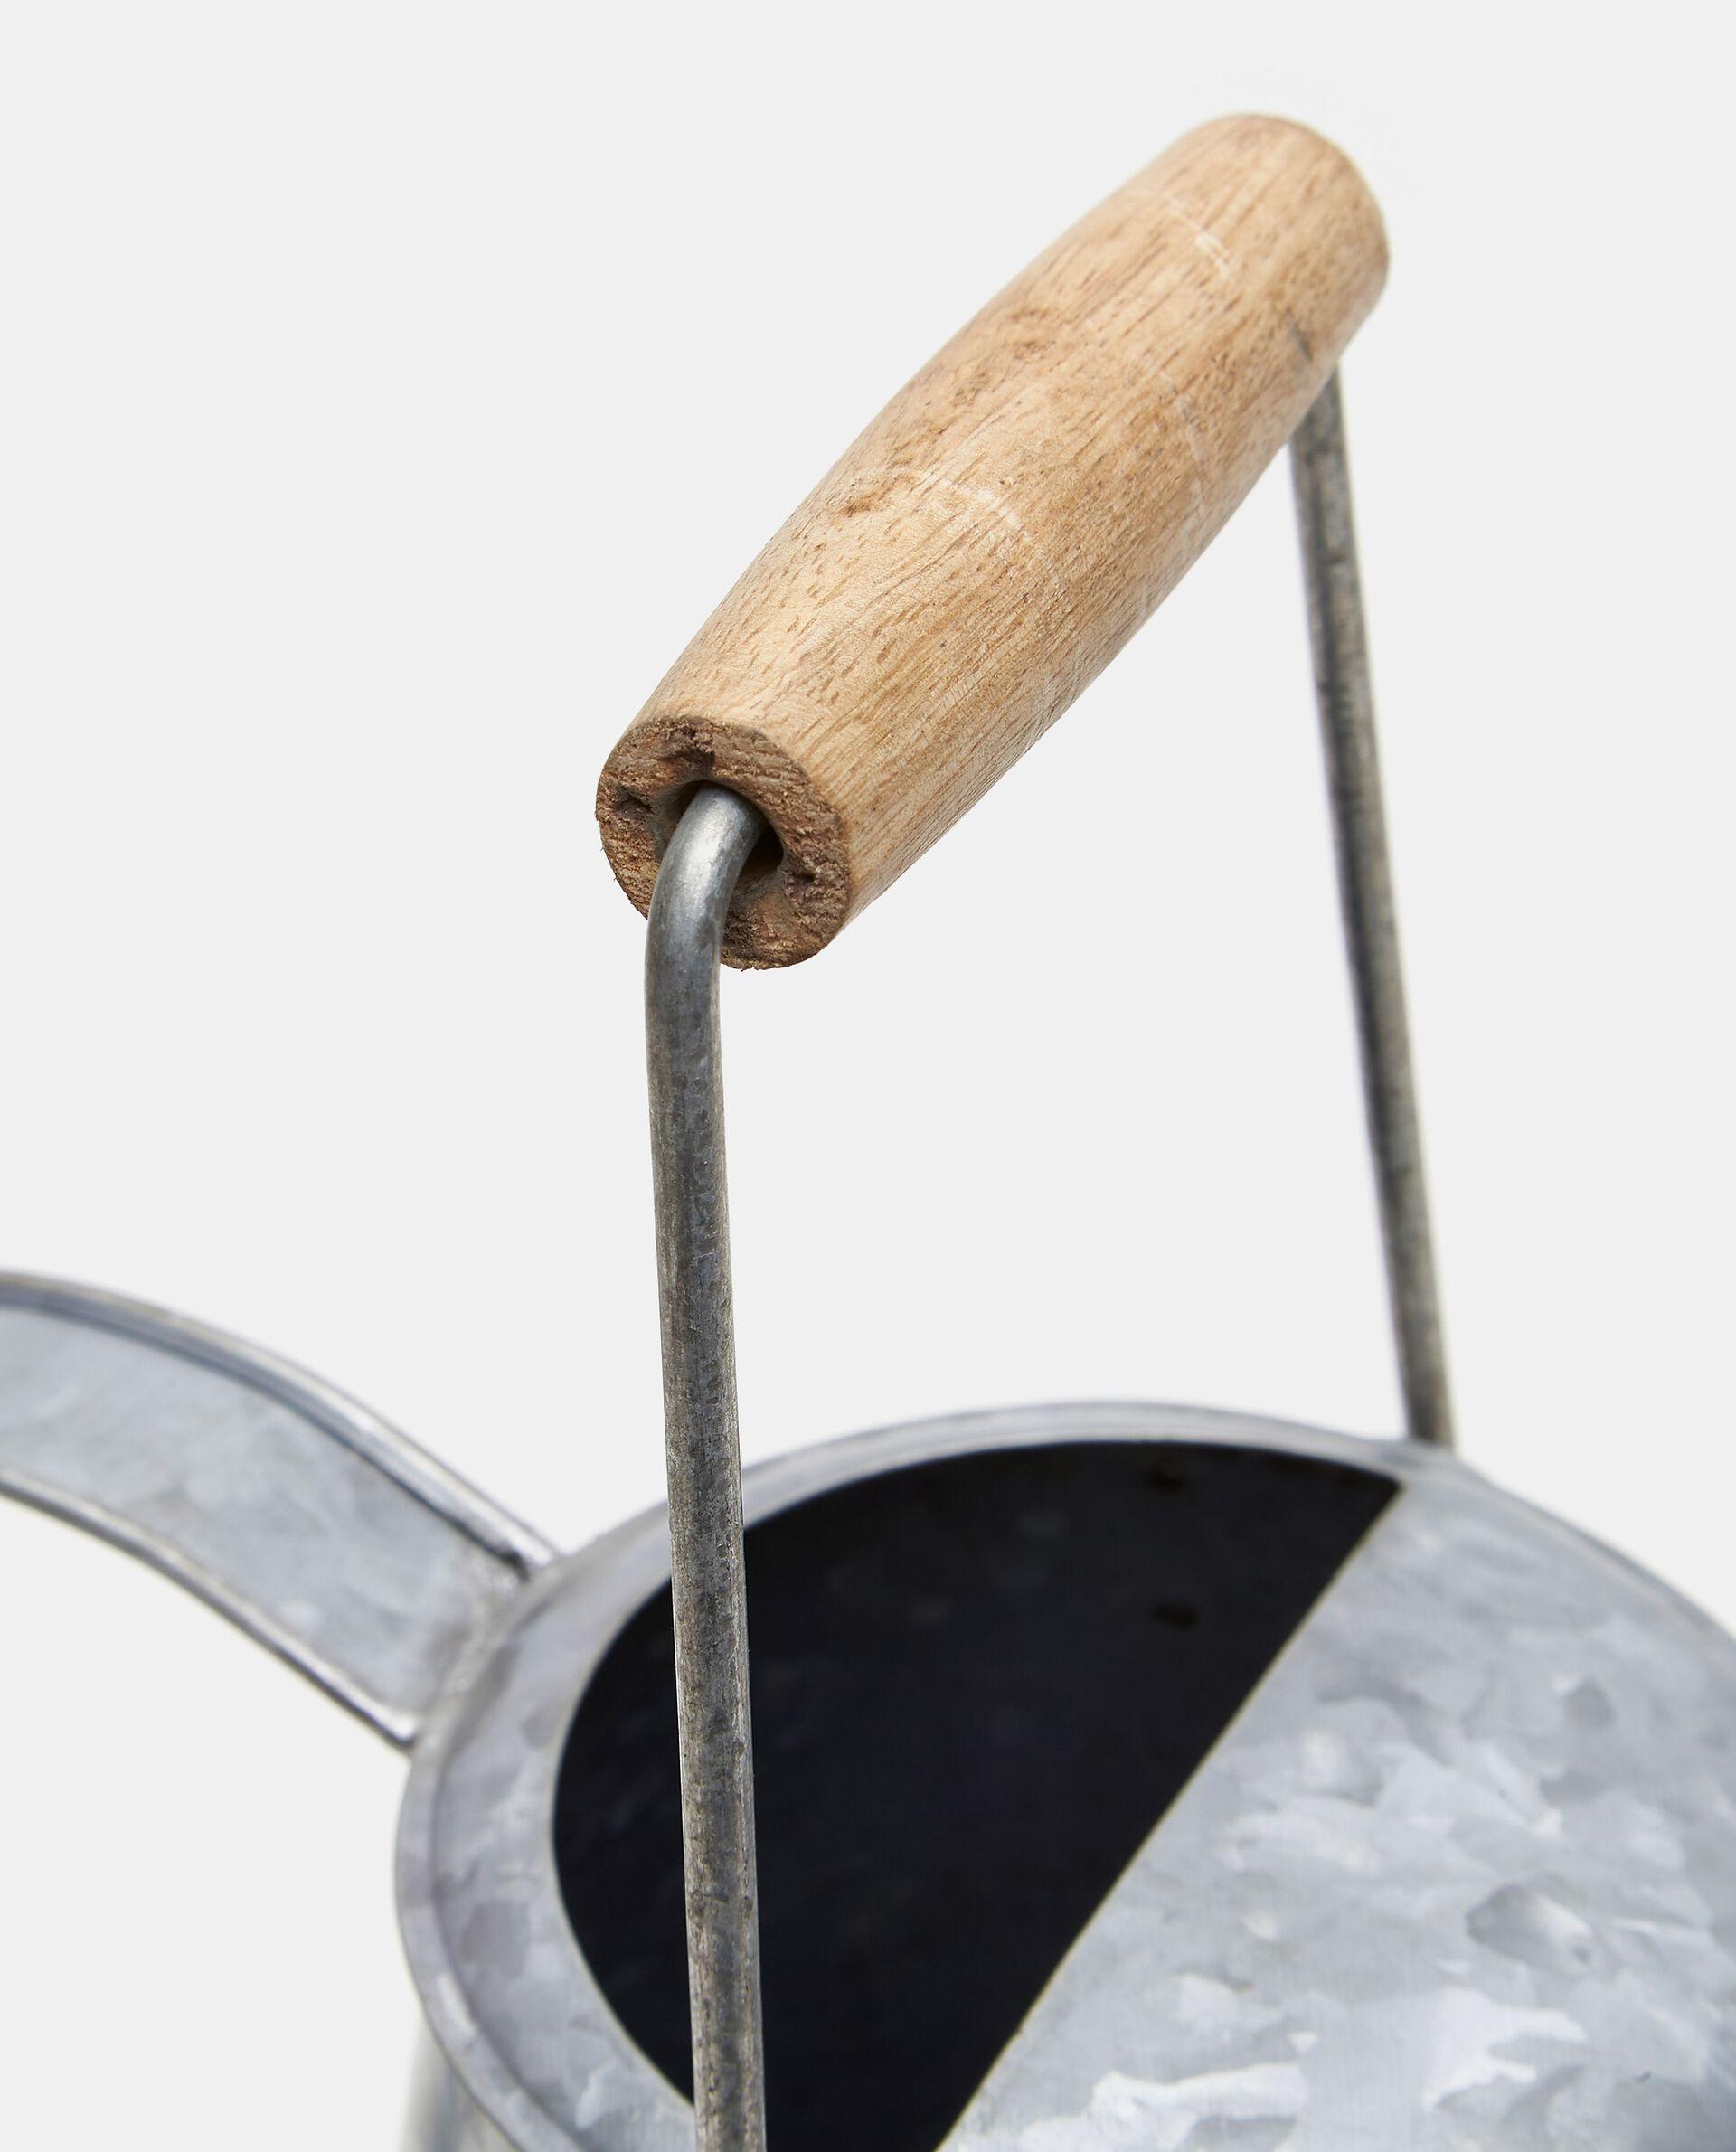 Innaffiatoio in ferro